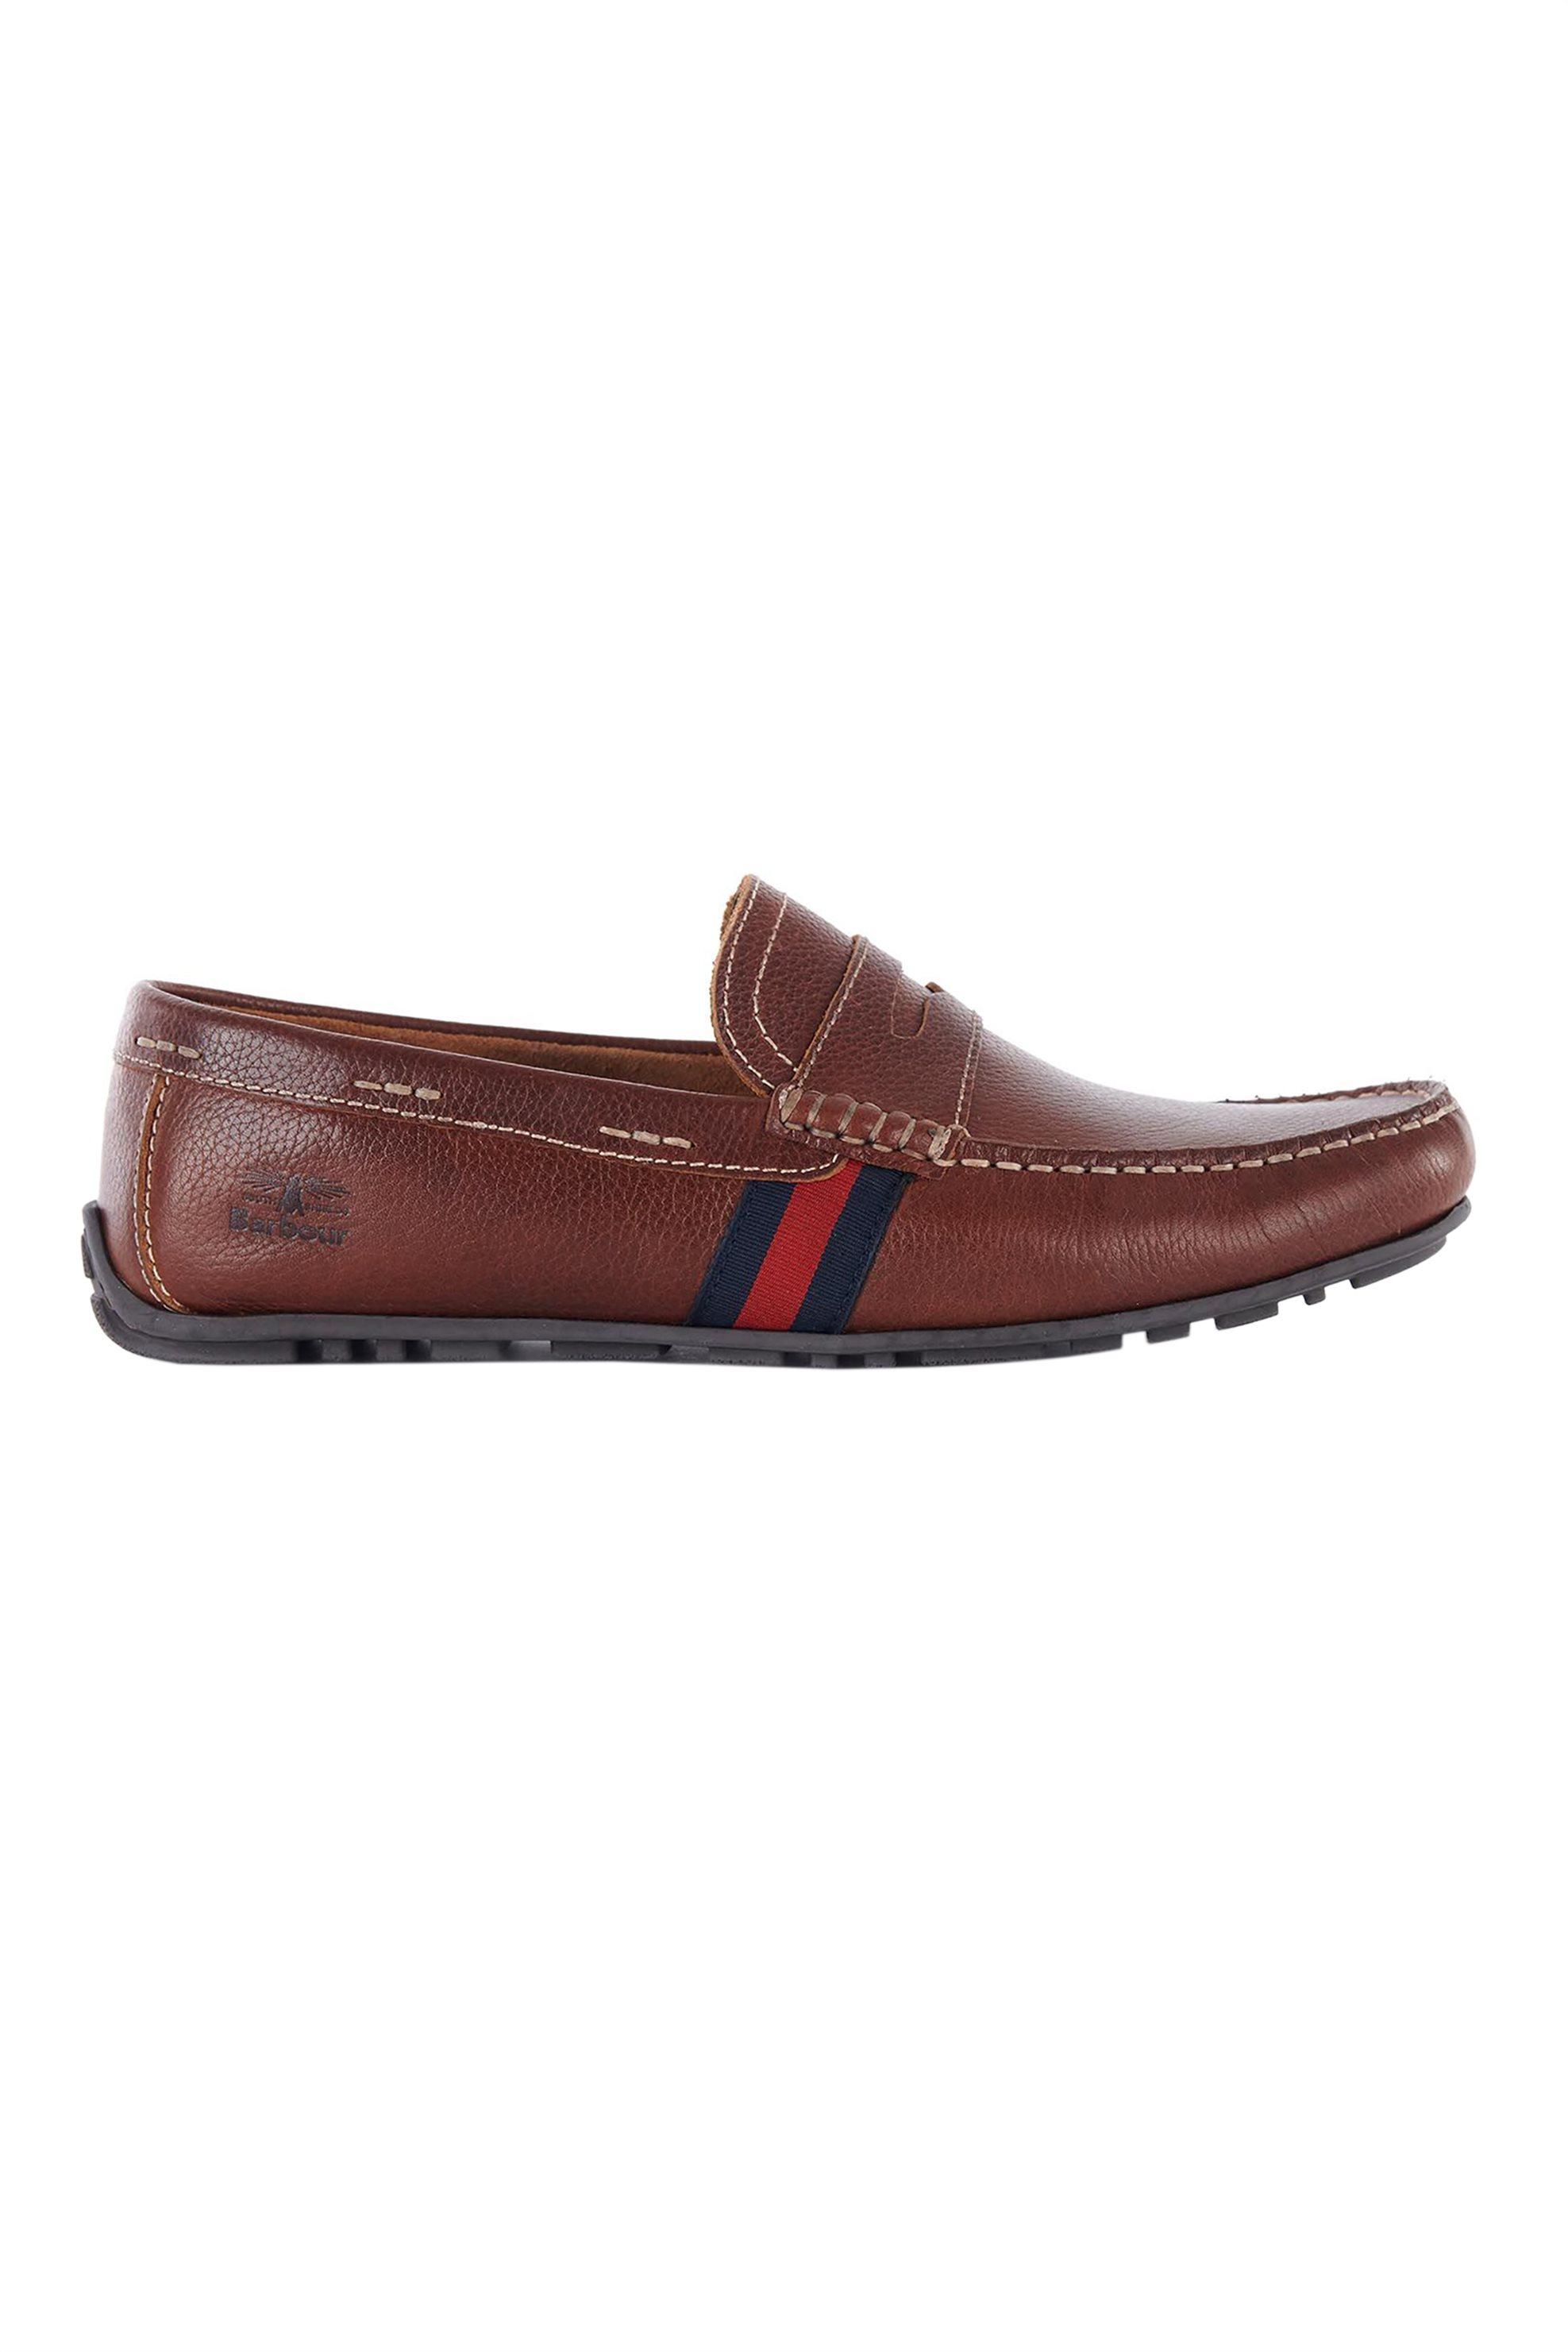 Barbour ανδρικά loafers με ανάγλυφο λογότυπο